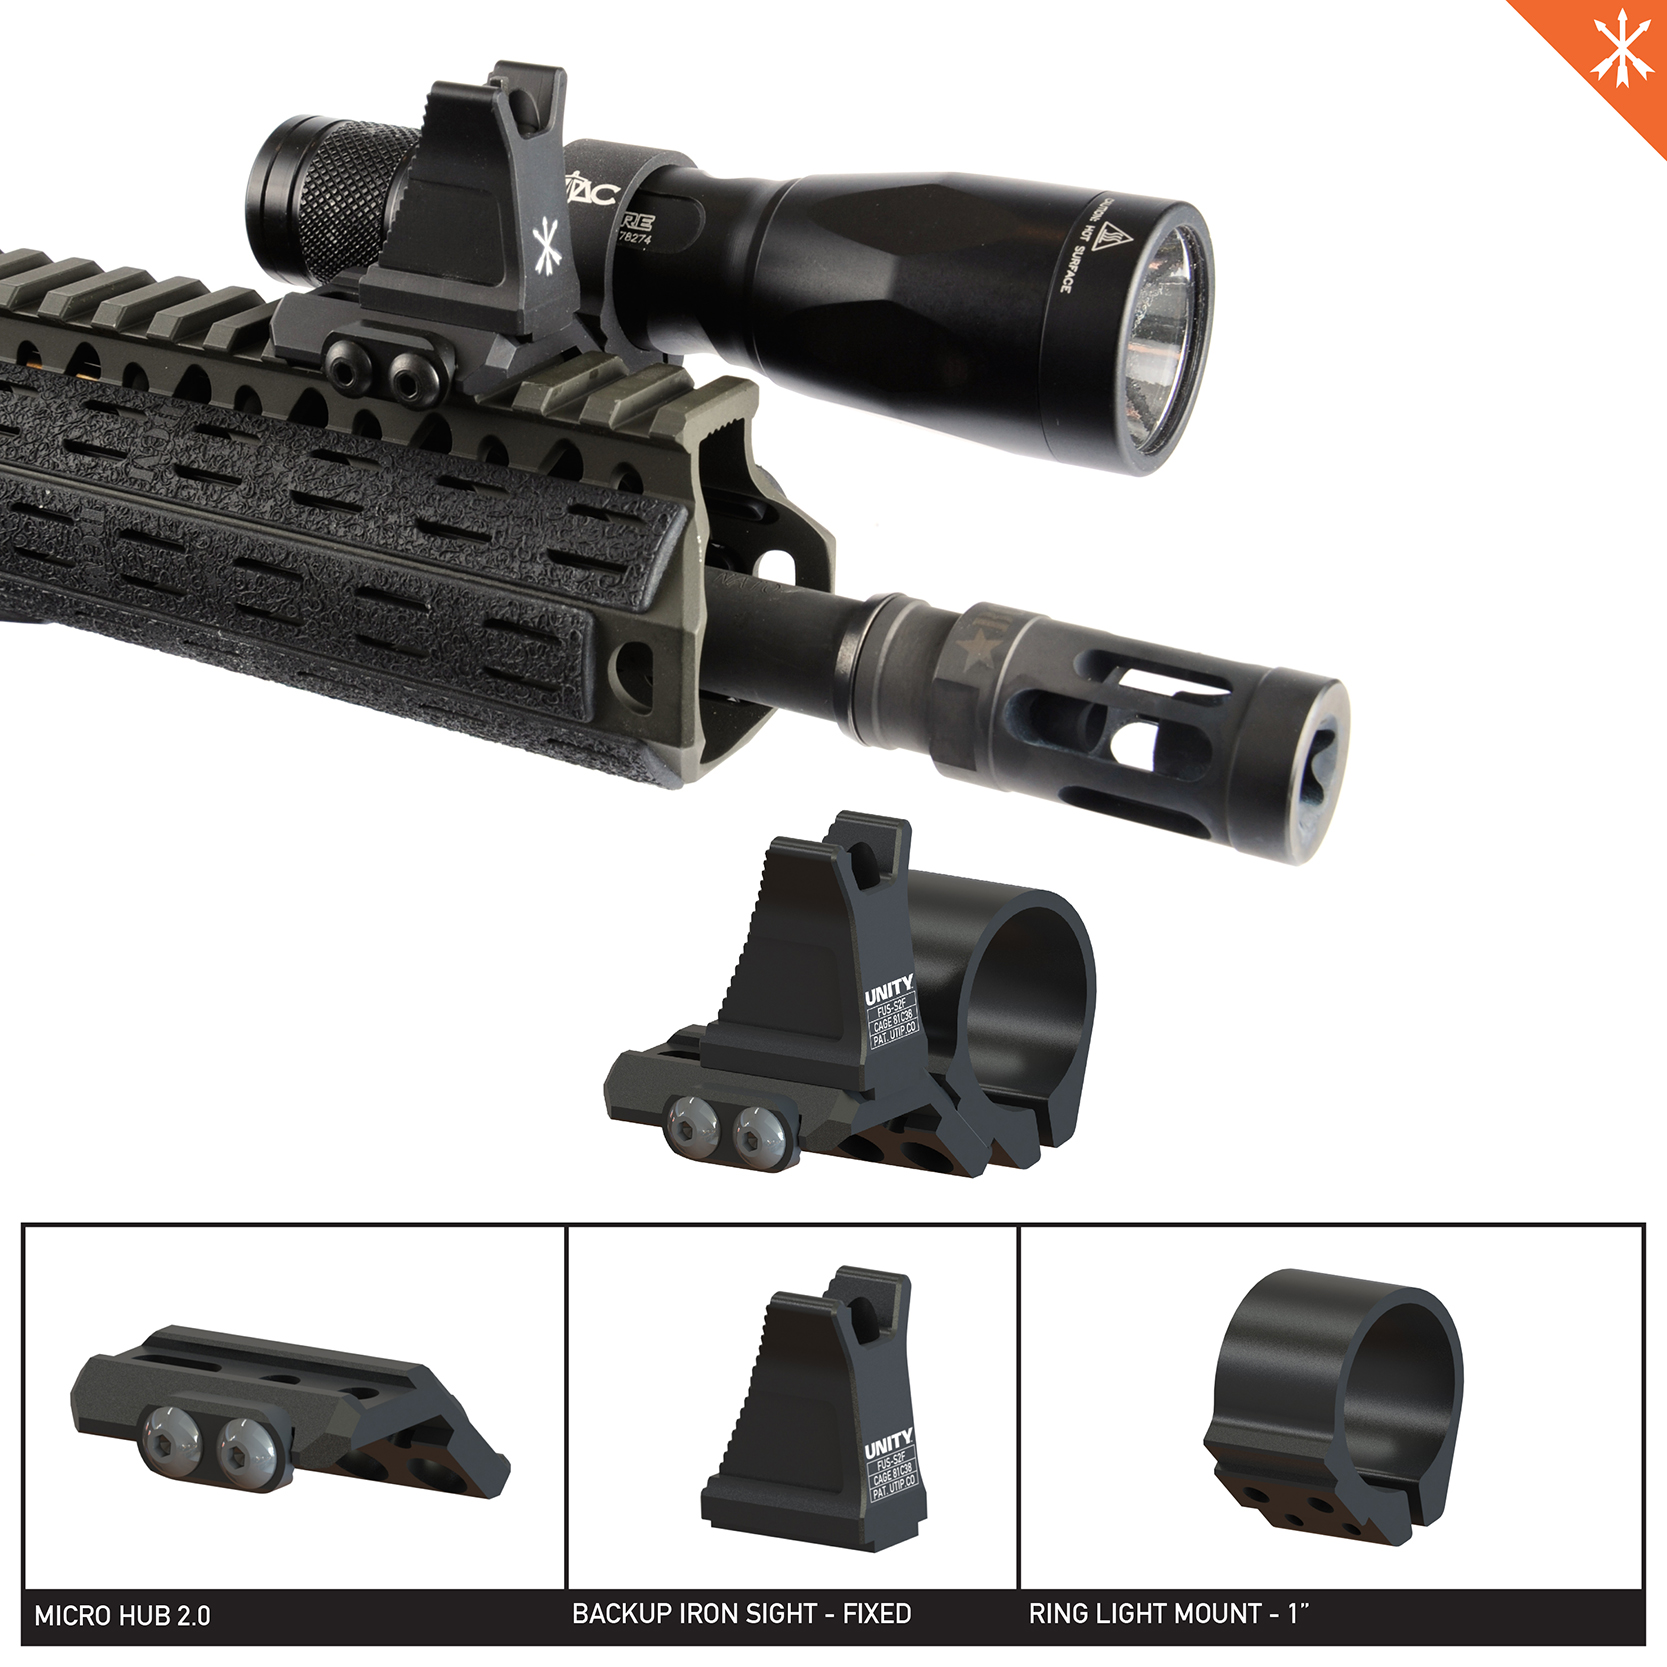 Unity Tactical FUSION - Fixed Backup Iron Sight